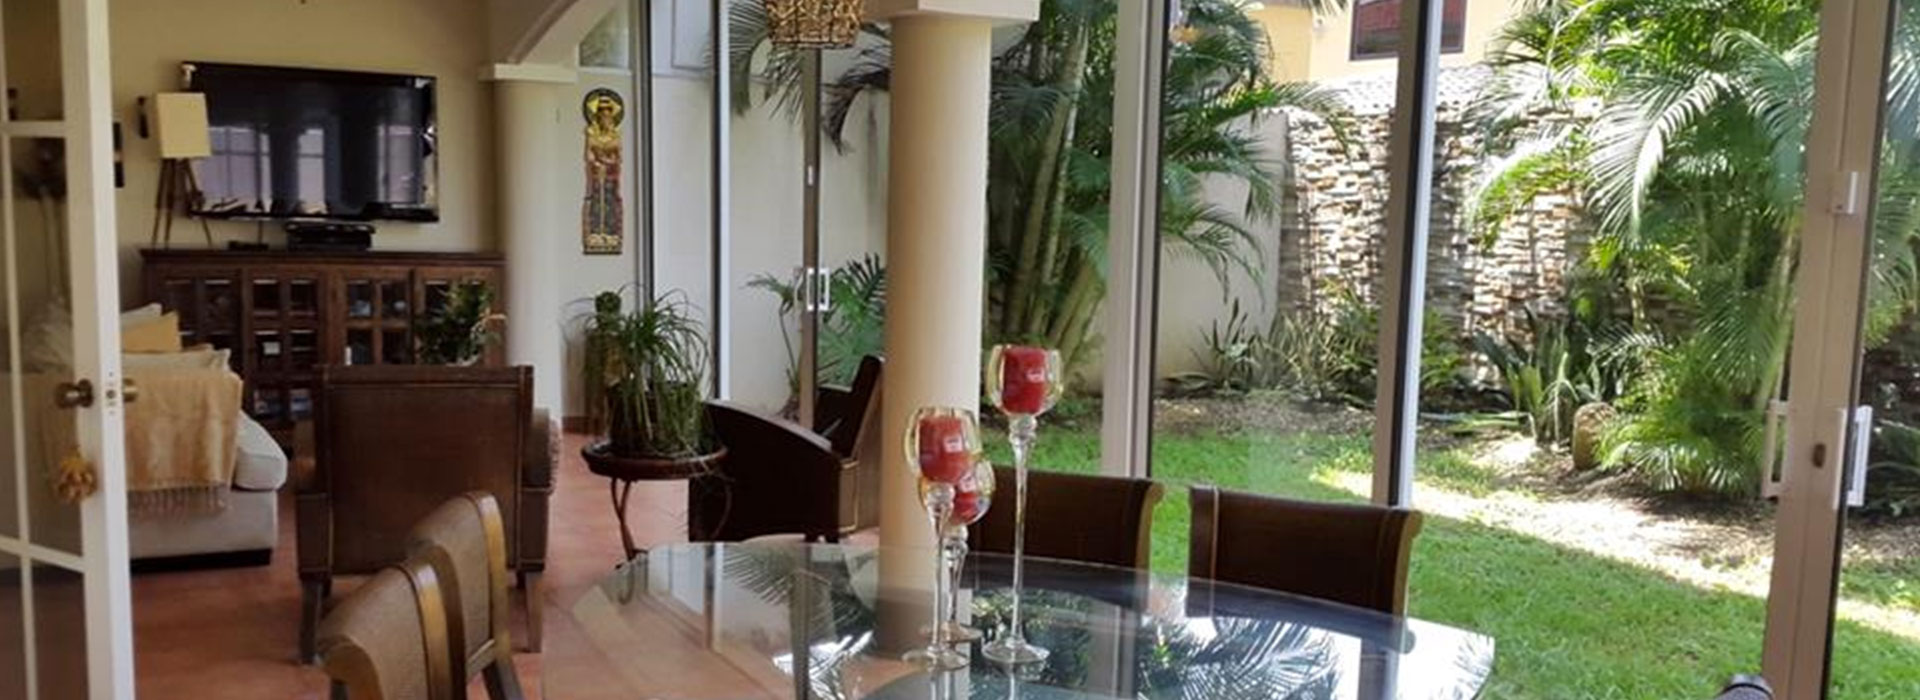 Costa Del Este Family House, Panama - PAN (photo 1)